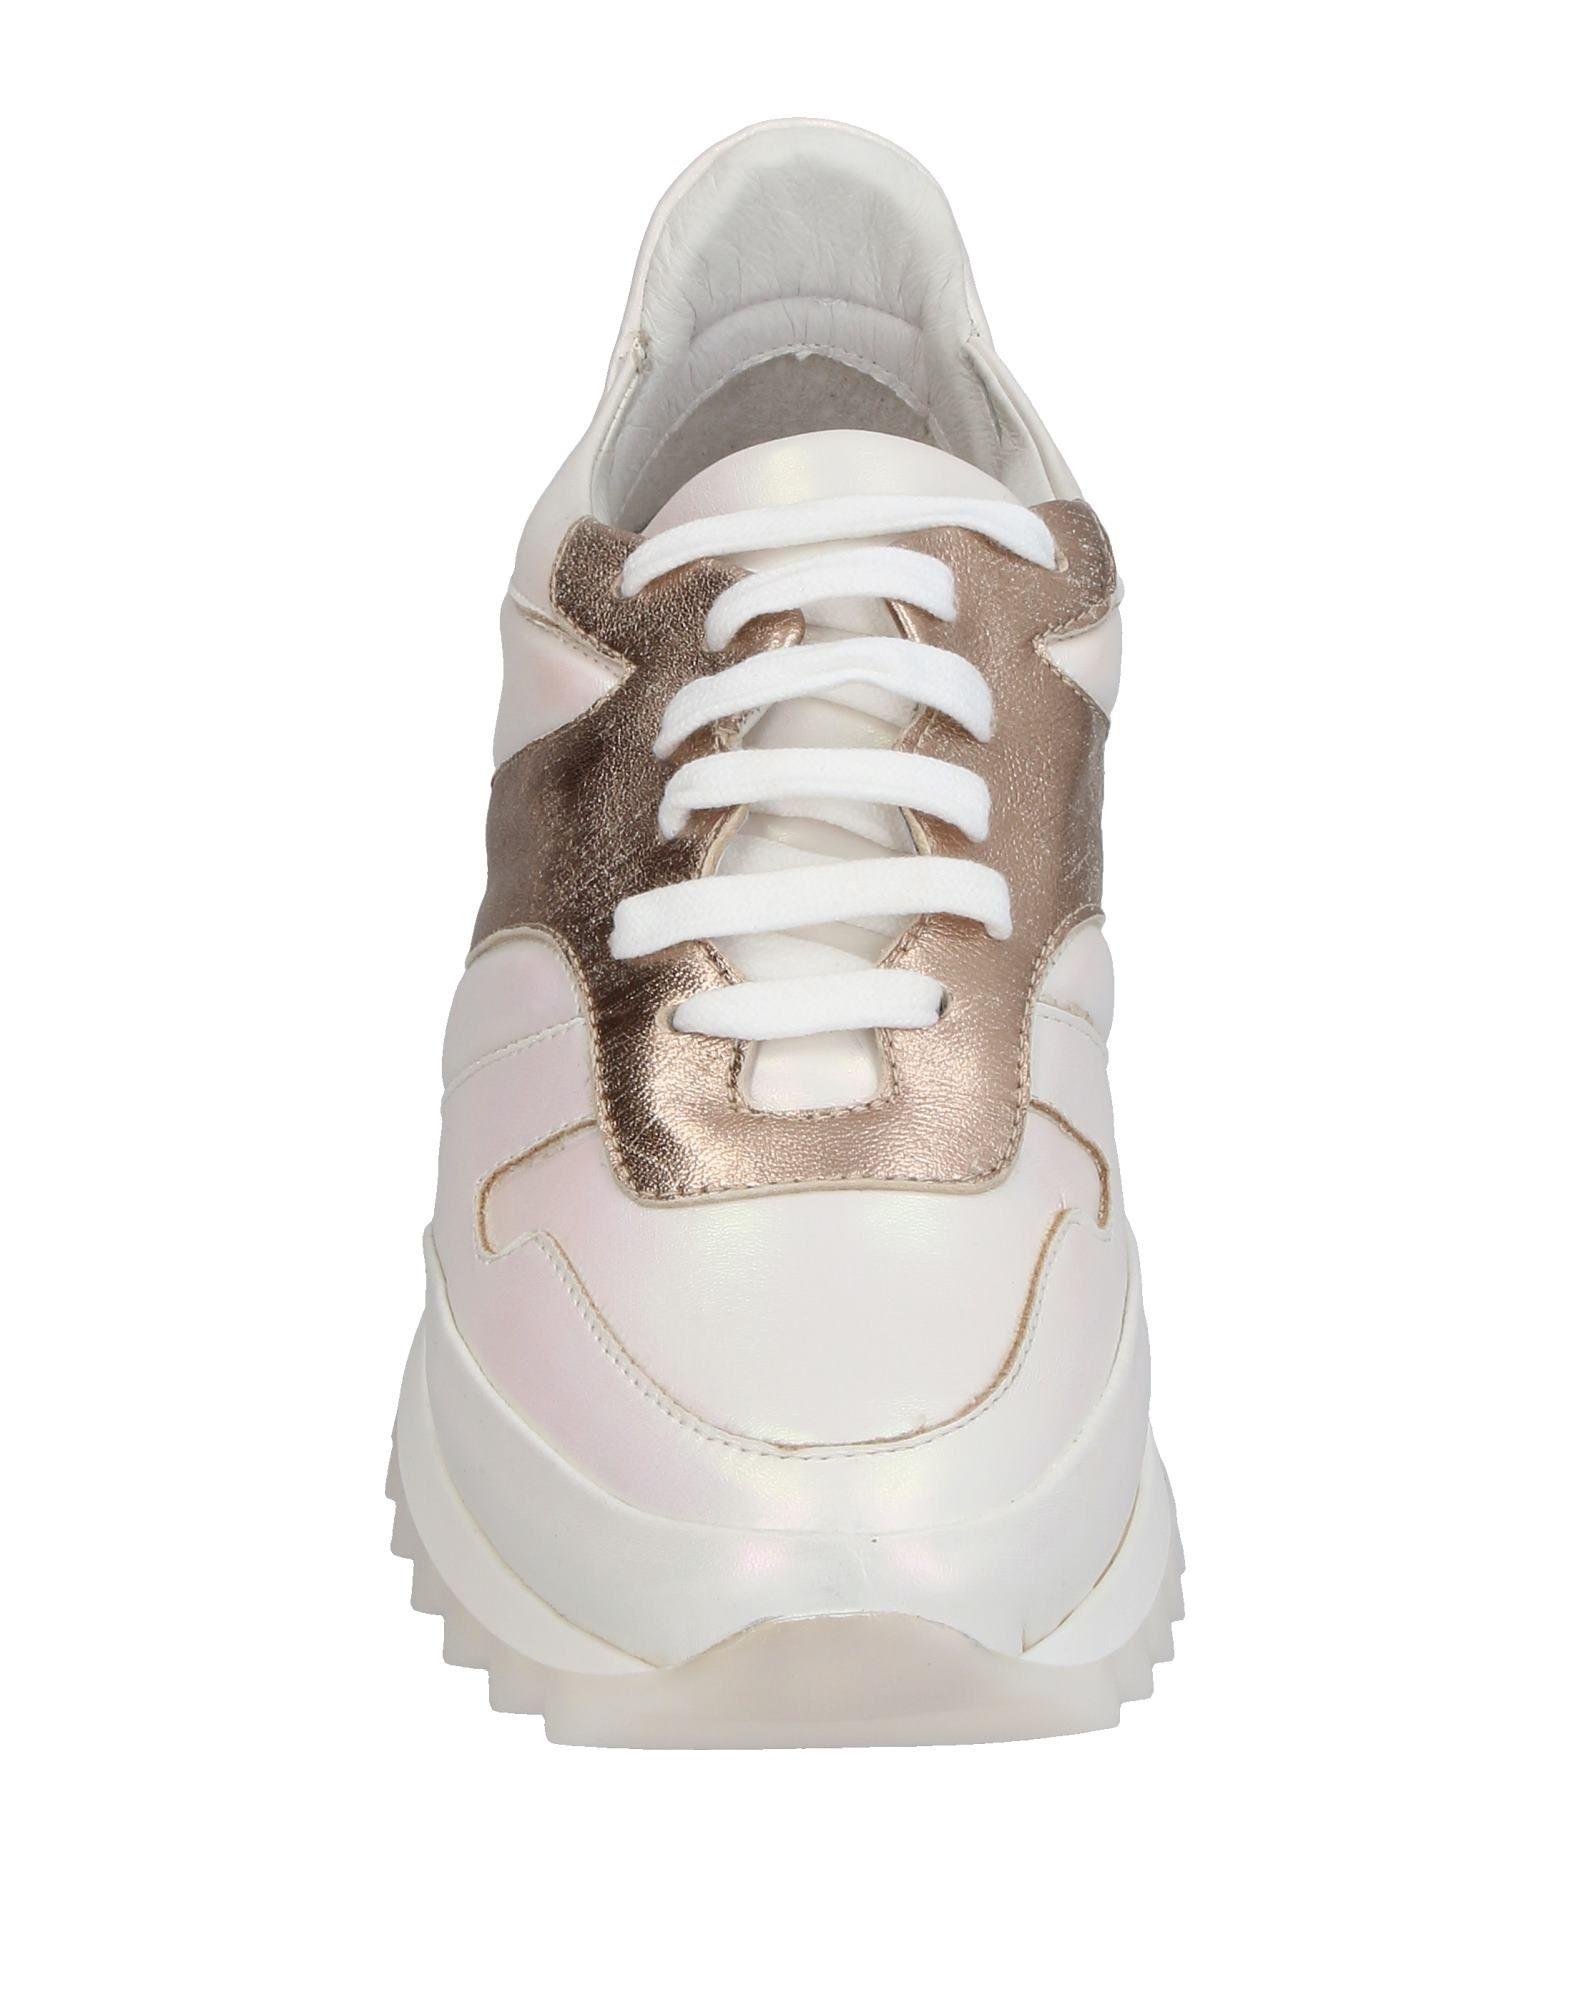 Svnty Sneakers Sneakers Svnty Damen  11392397PU  f68f89